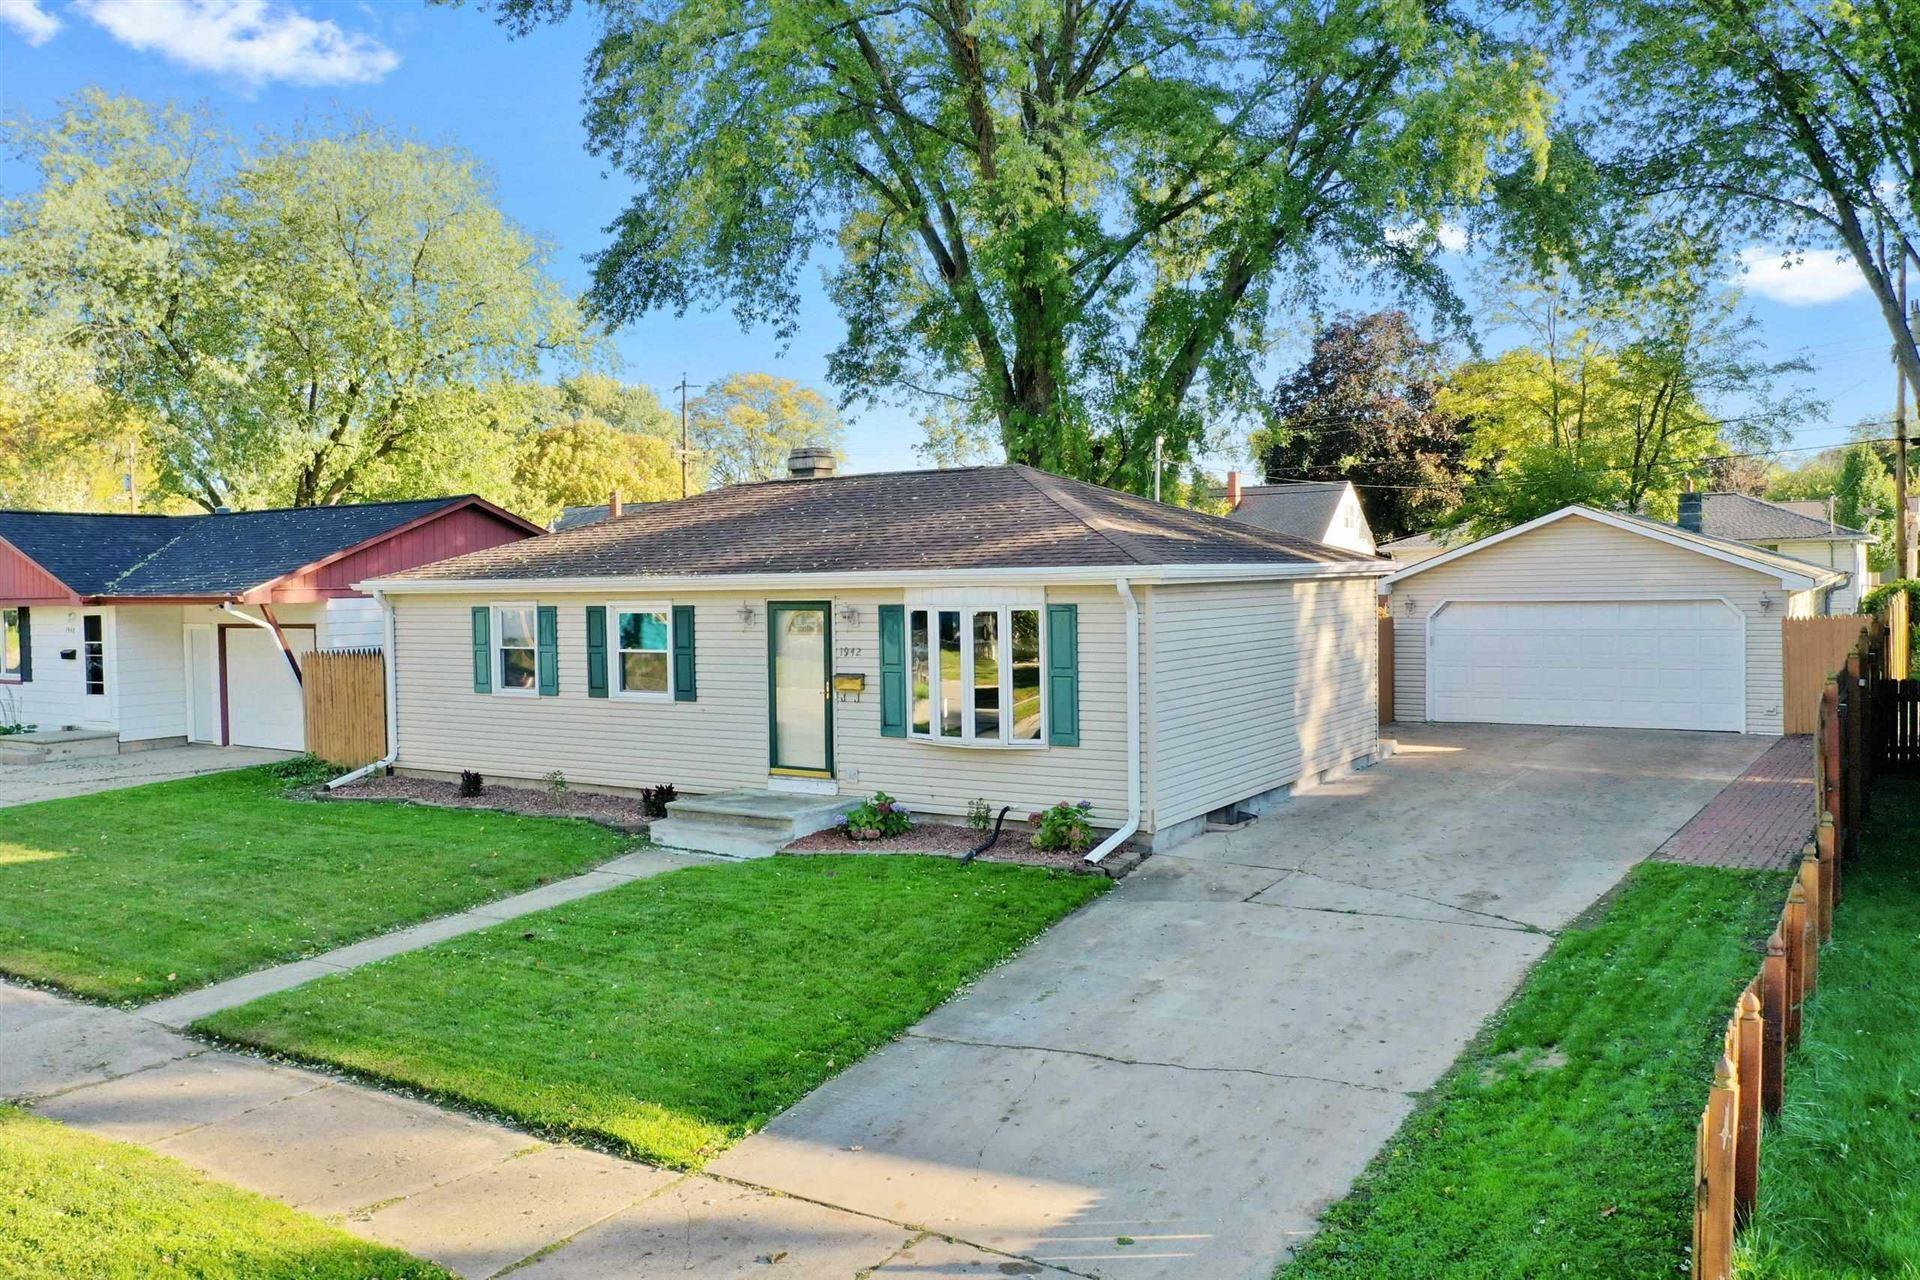 1942 HAROLD Street, Green Bay, WI 54302 - MLS#: 50249689